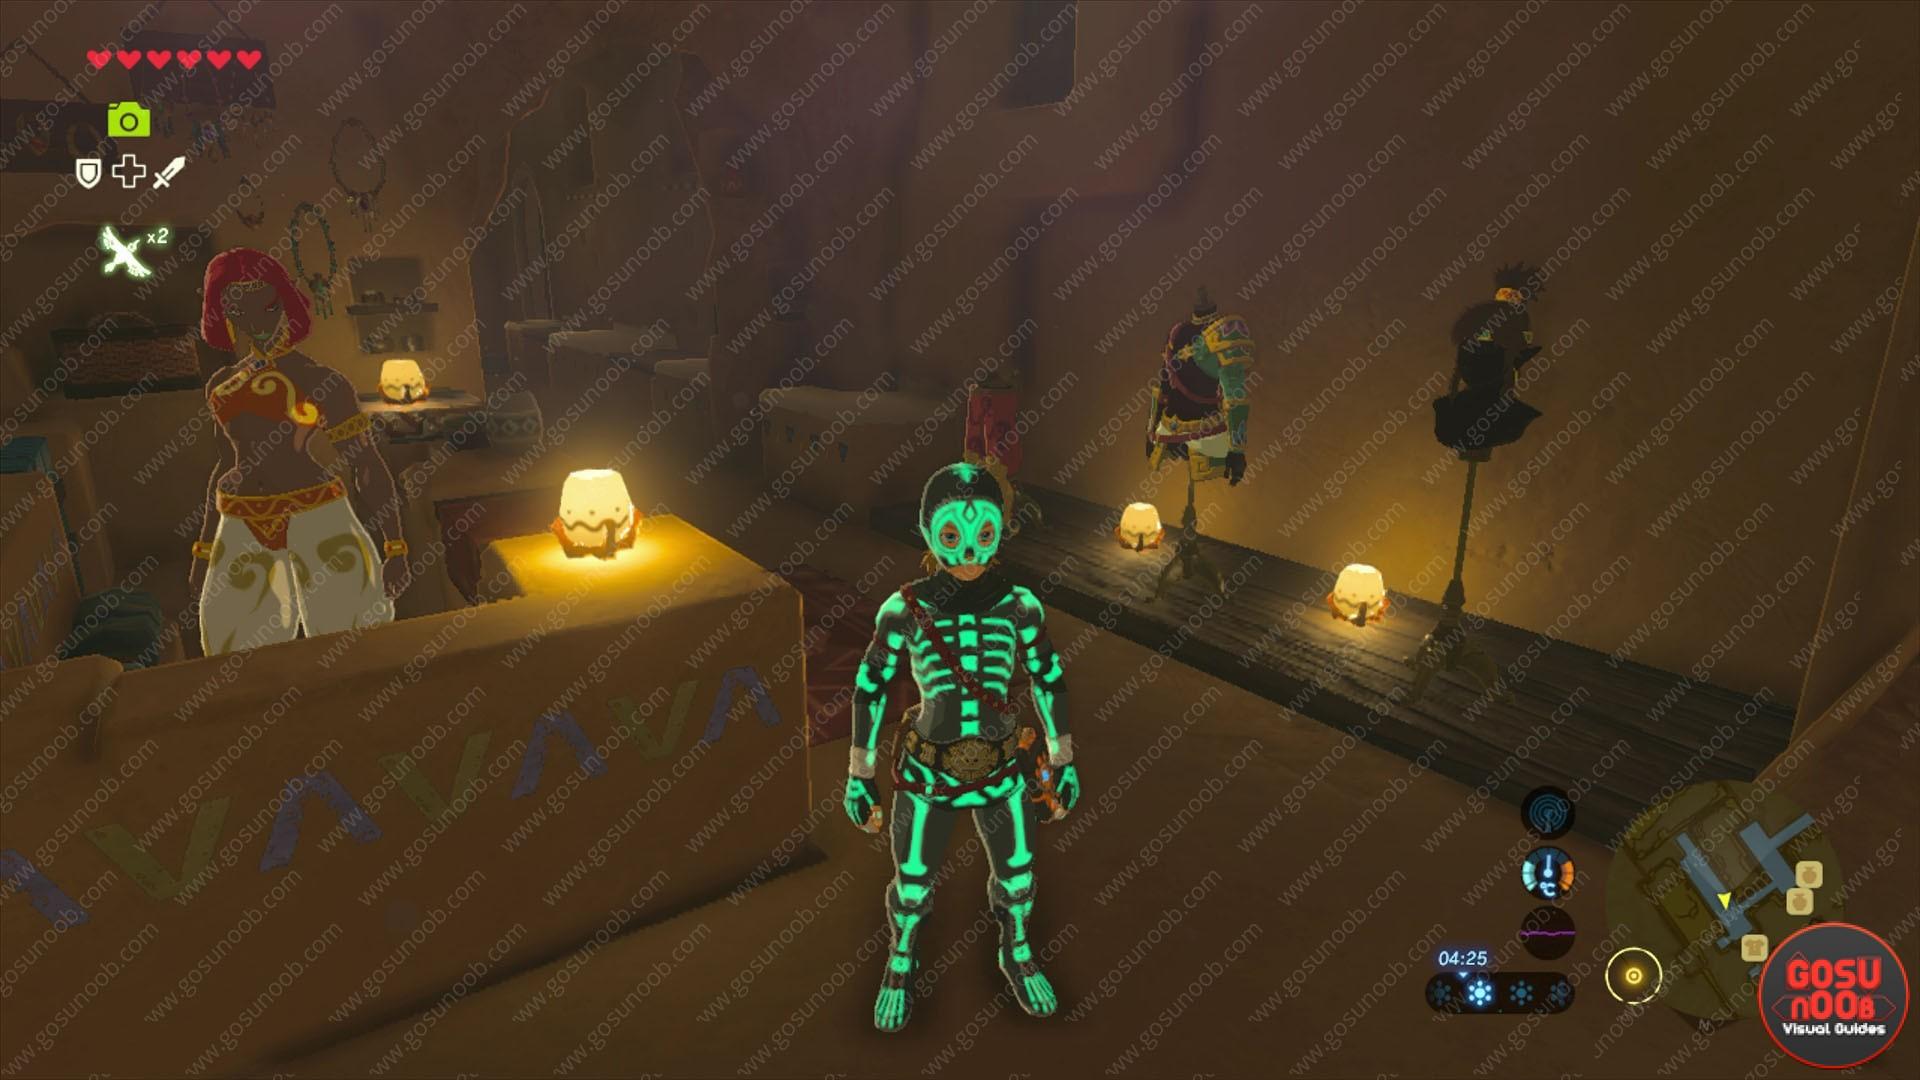 Zelda BoTW Secret Club Secret Quest - How to get Gerudo